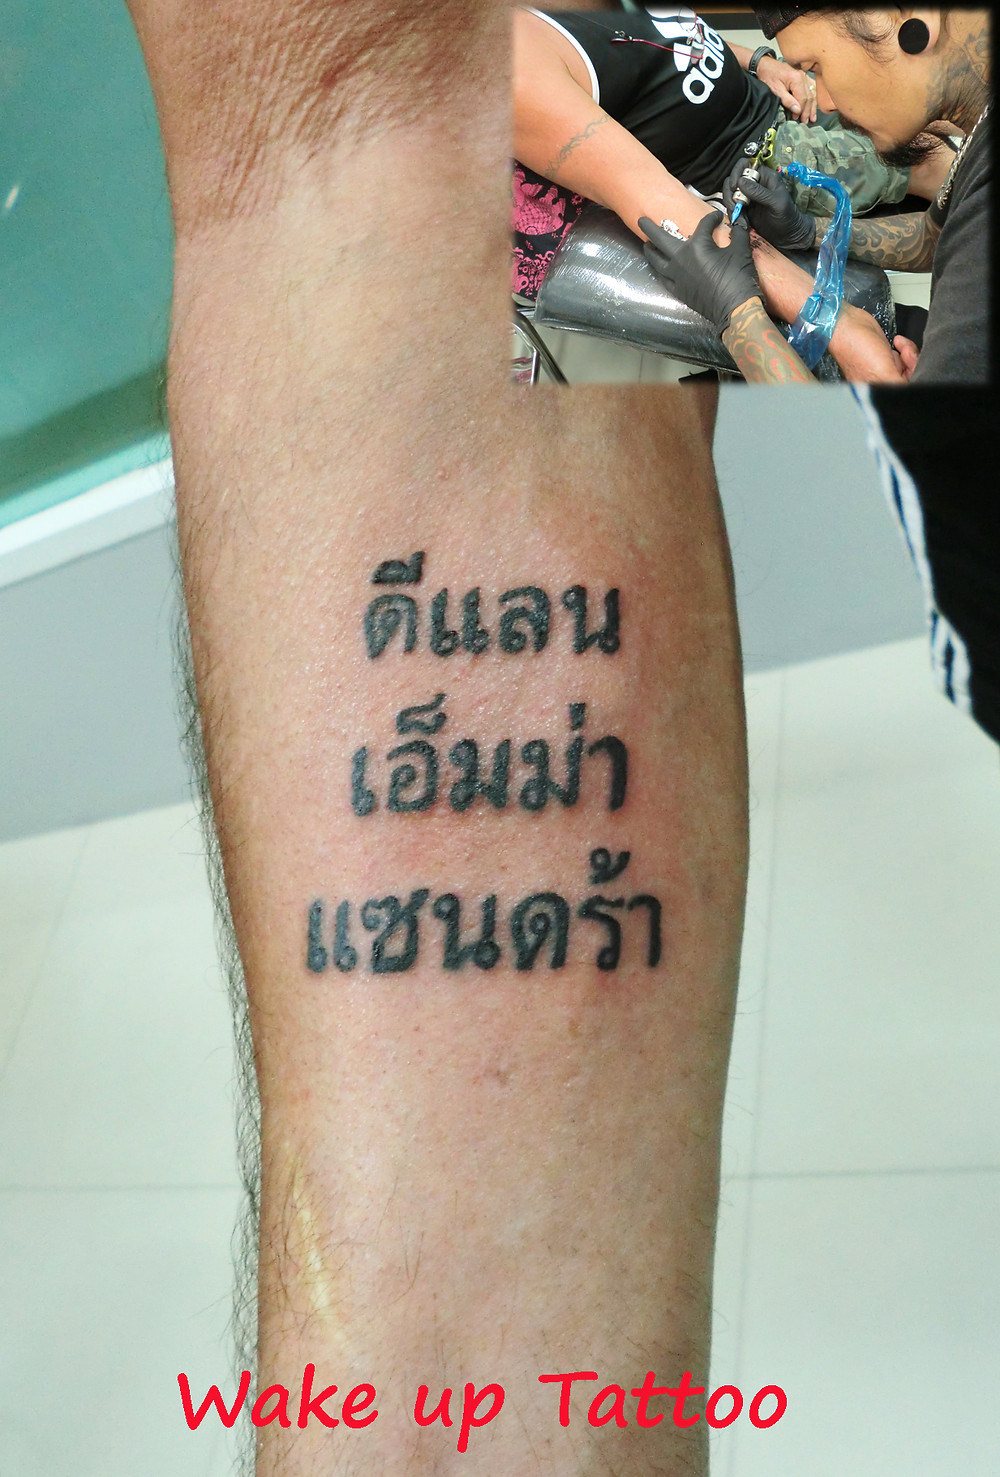 Tattoo by Wake up Tattoo Phuket